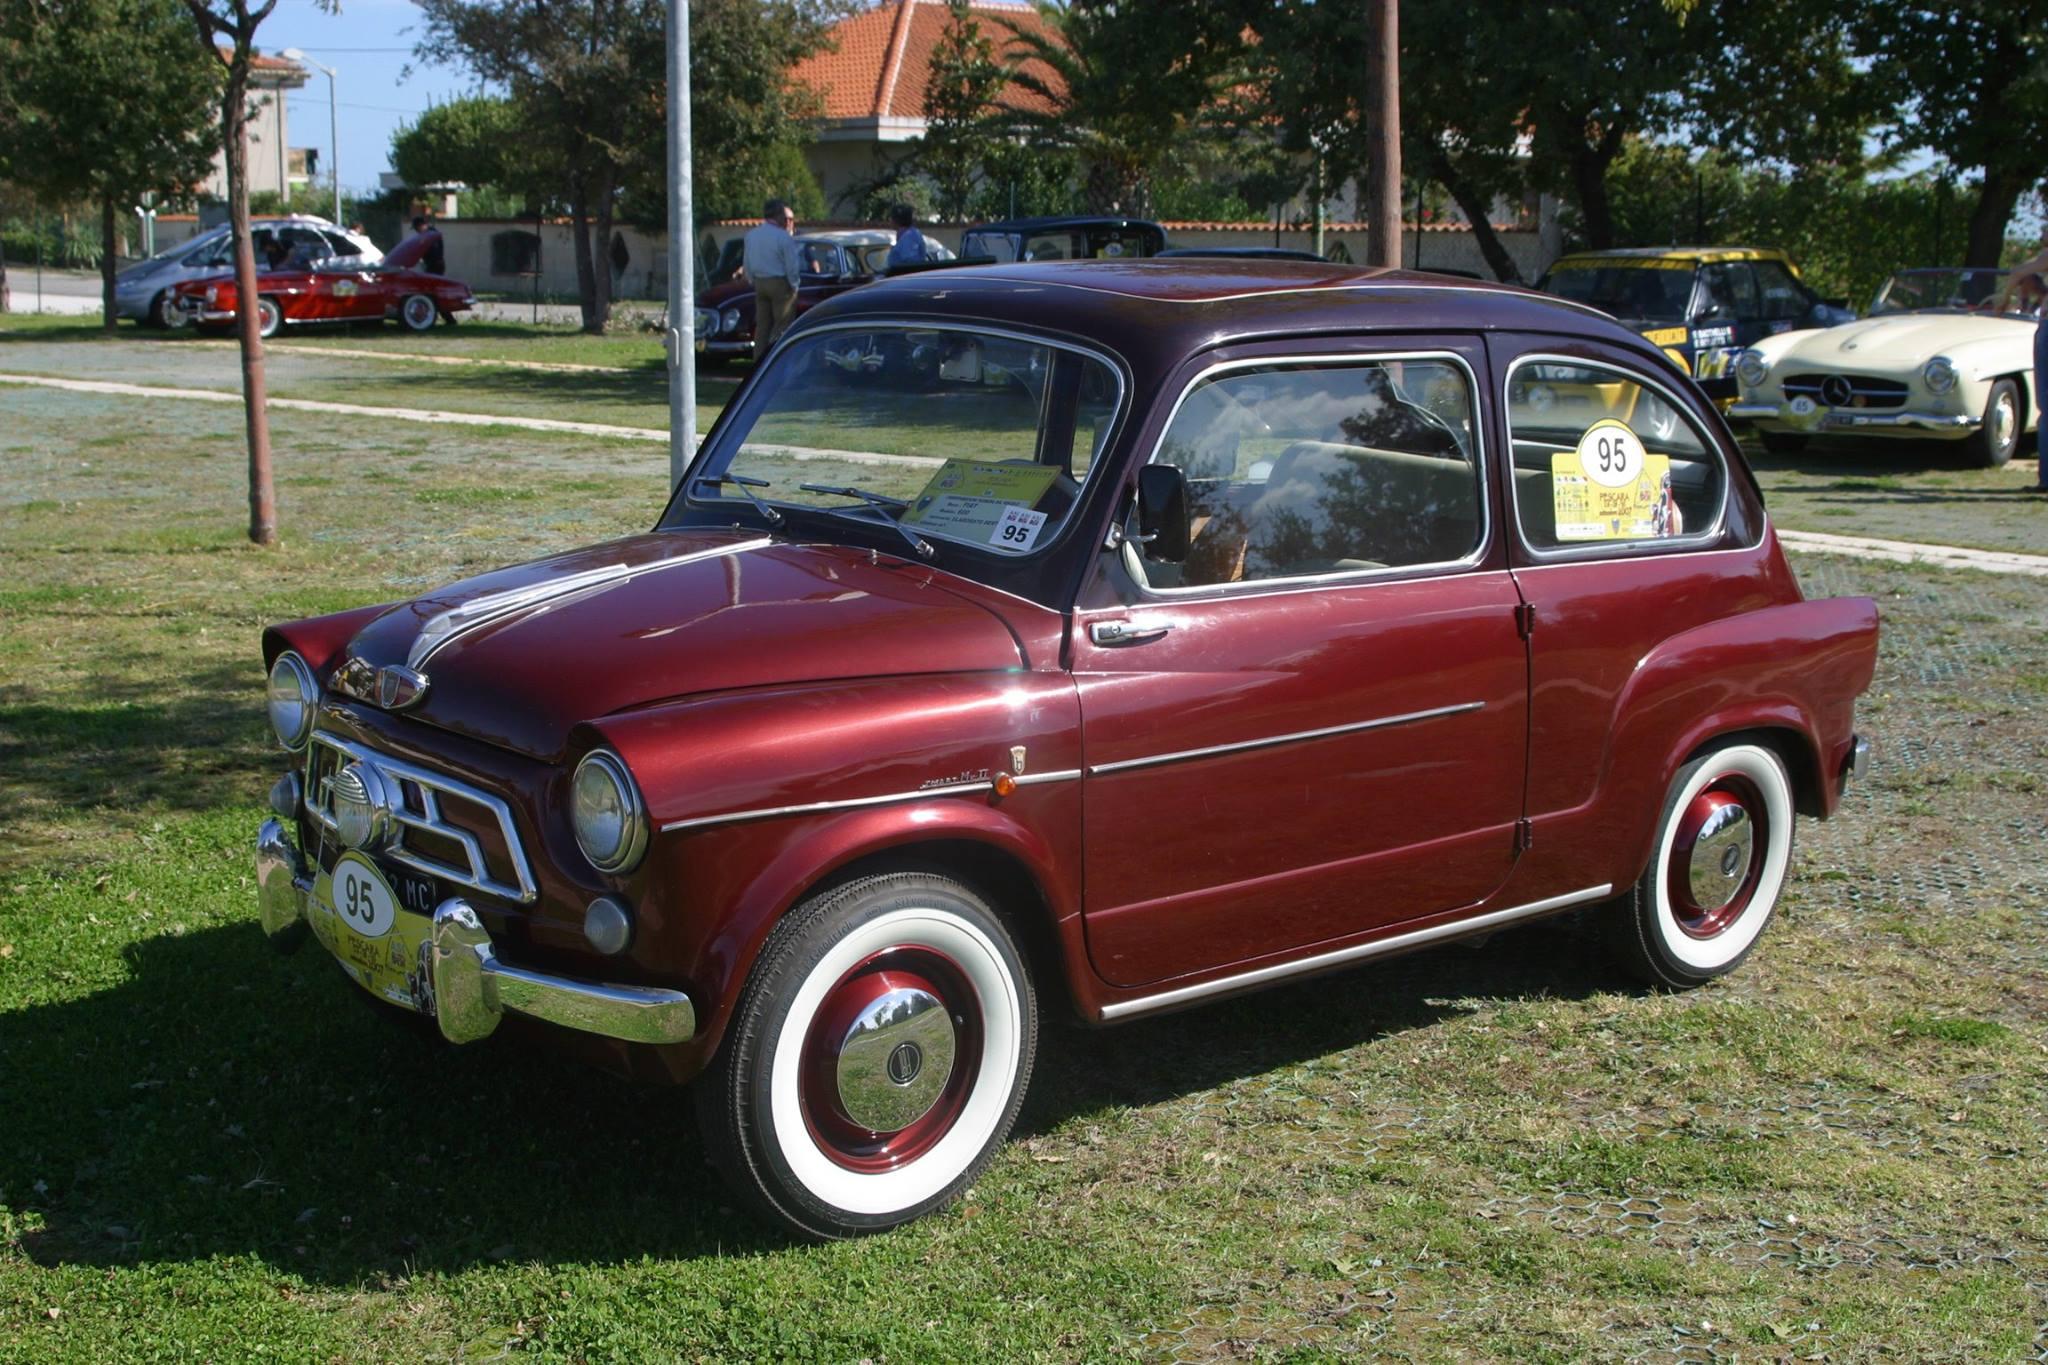 Fiat-600-Bertone-Smart-MK-II-1956